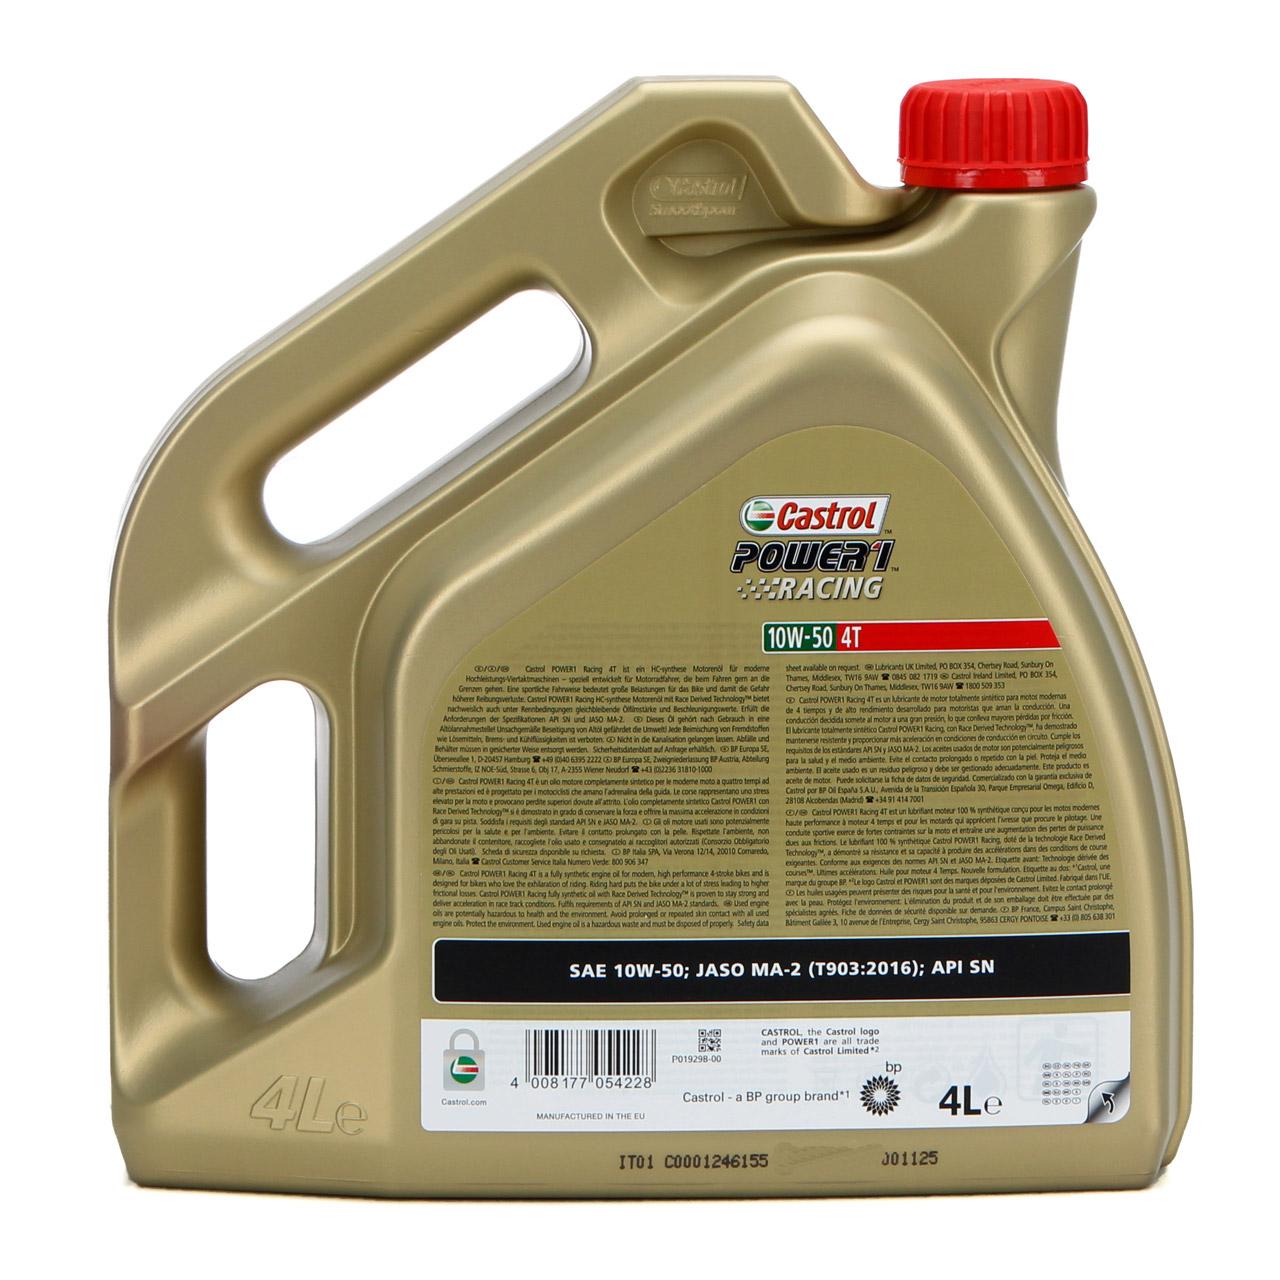 4L 4 Liter CASTROL Motoröl Öl POWER 1 RACING 4T 4-TAKT 10W50 JASO MA-2 API SN